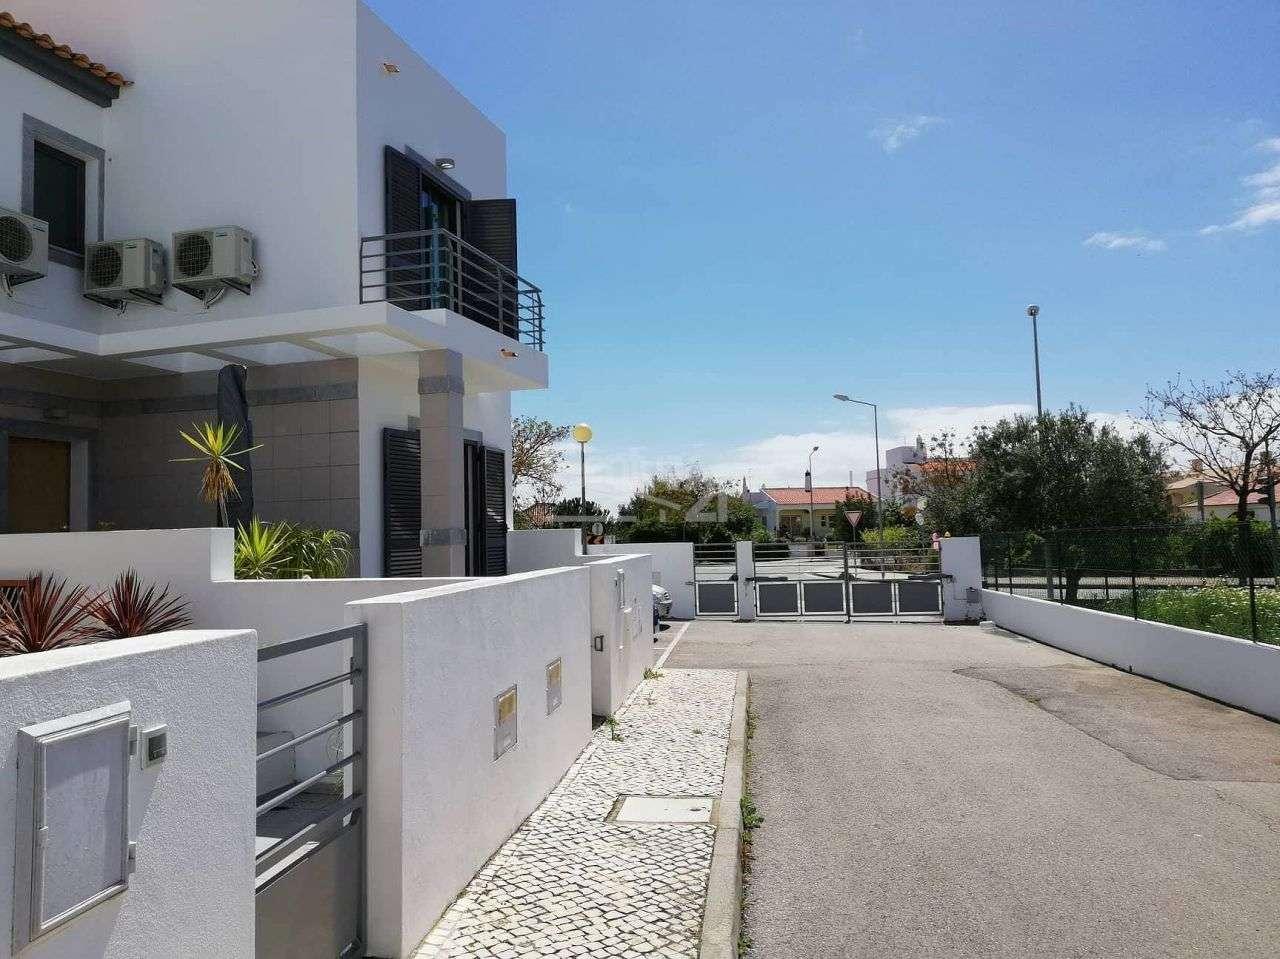 Moradia para comprar, Ferreiras, Faro - Foto 2